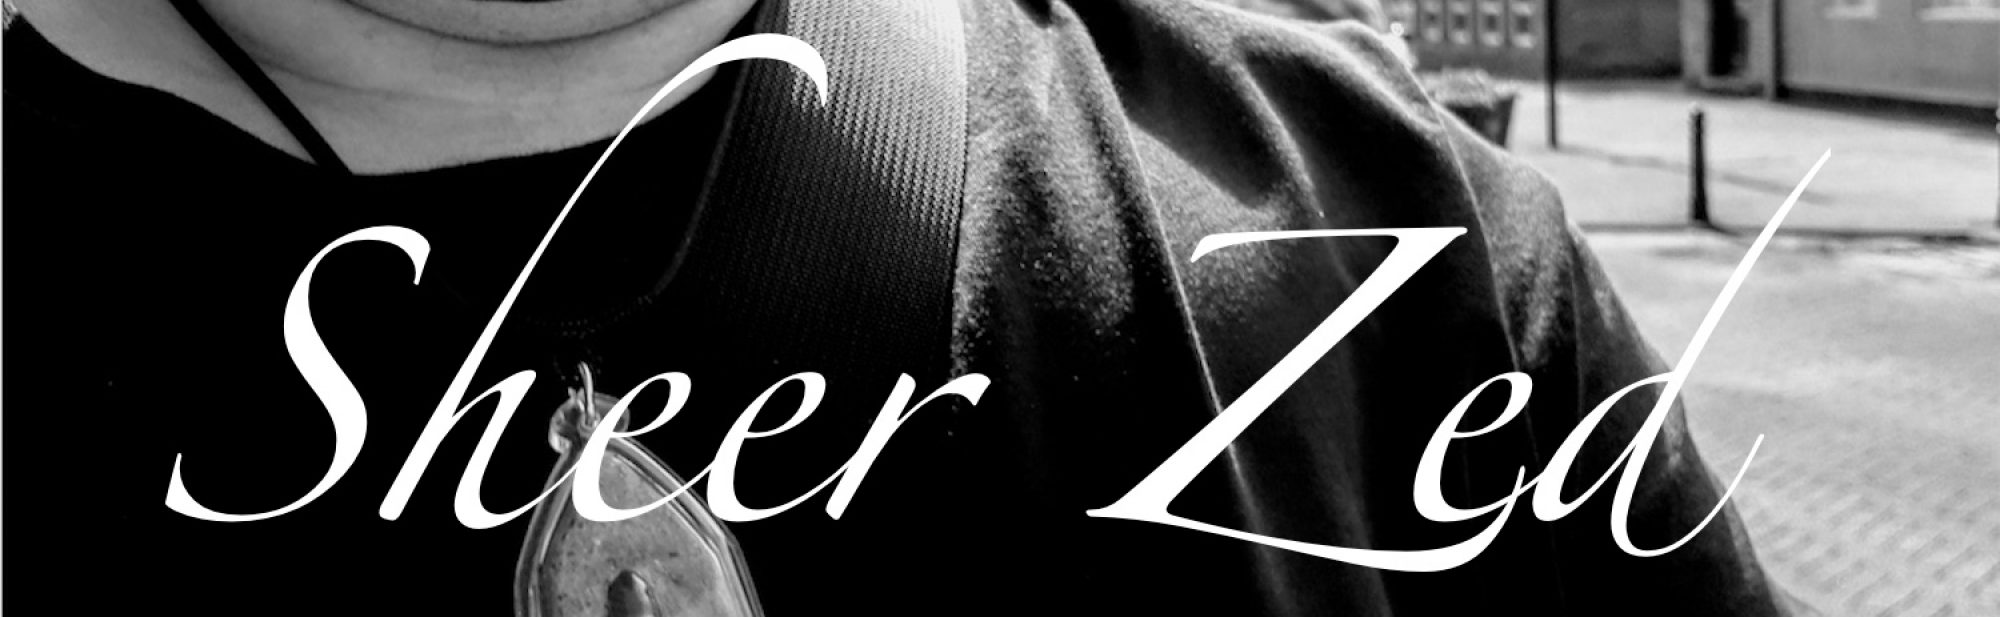 Sheer Zed • Electronic Musician • Artist • Writer • Shaman •